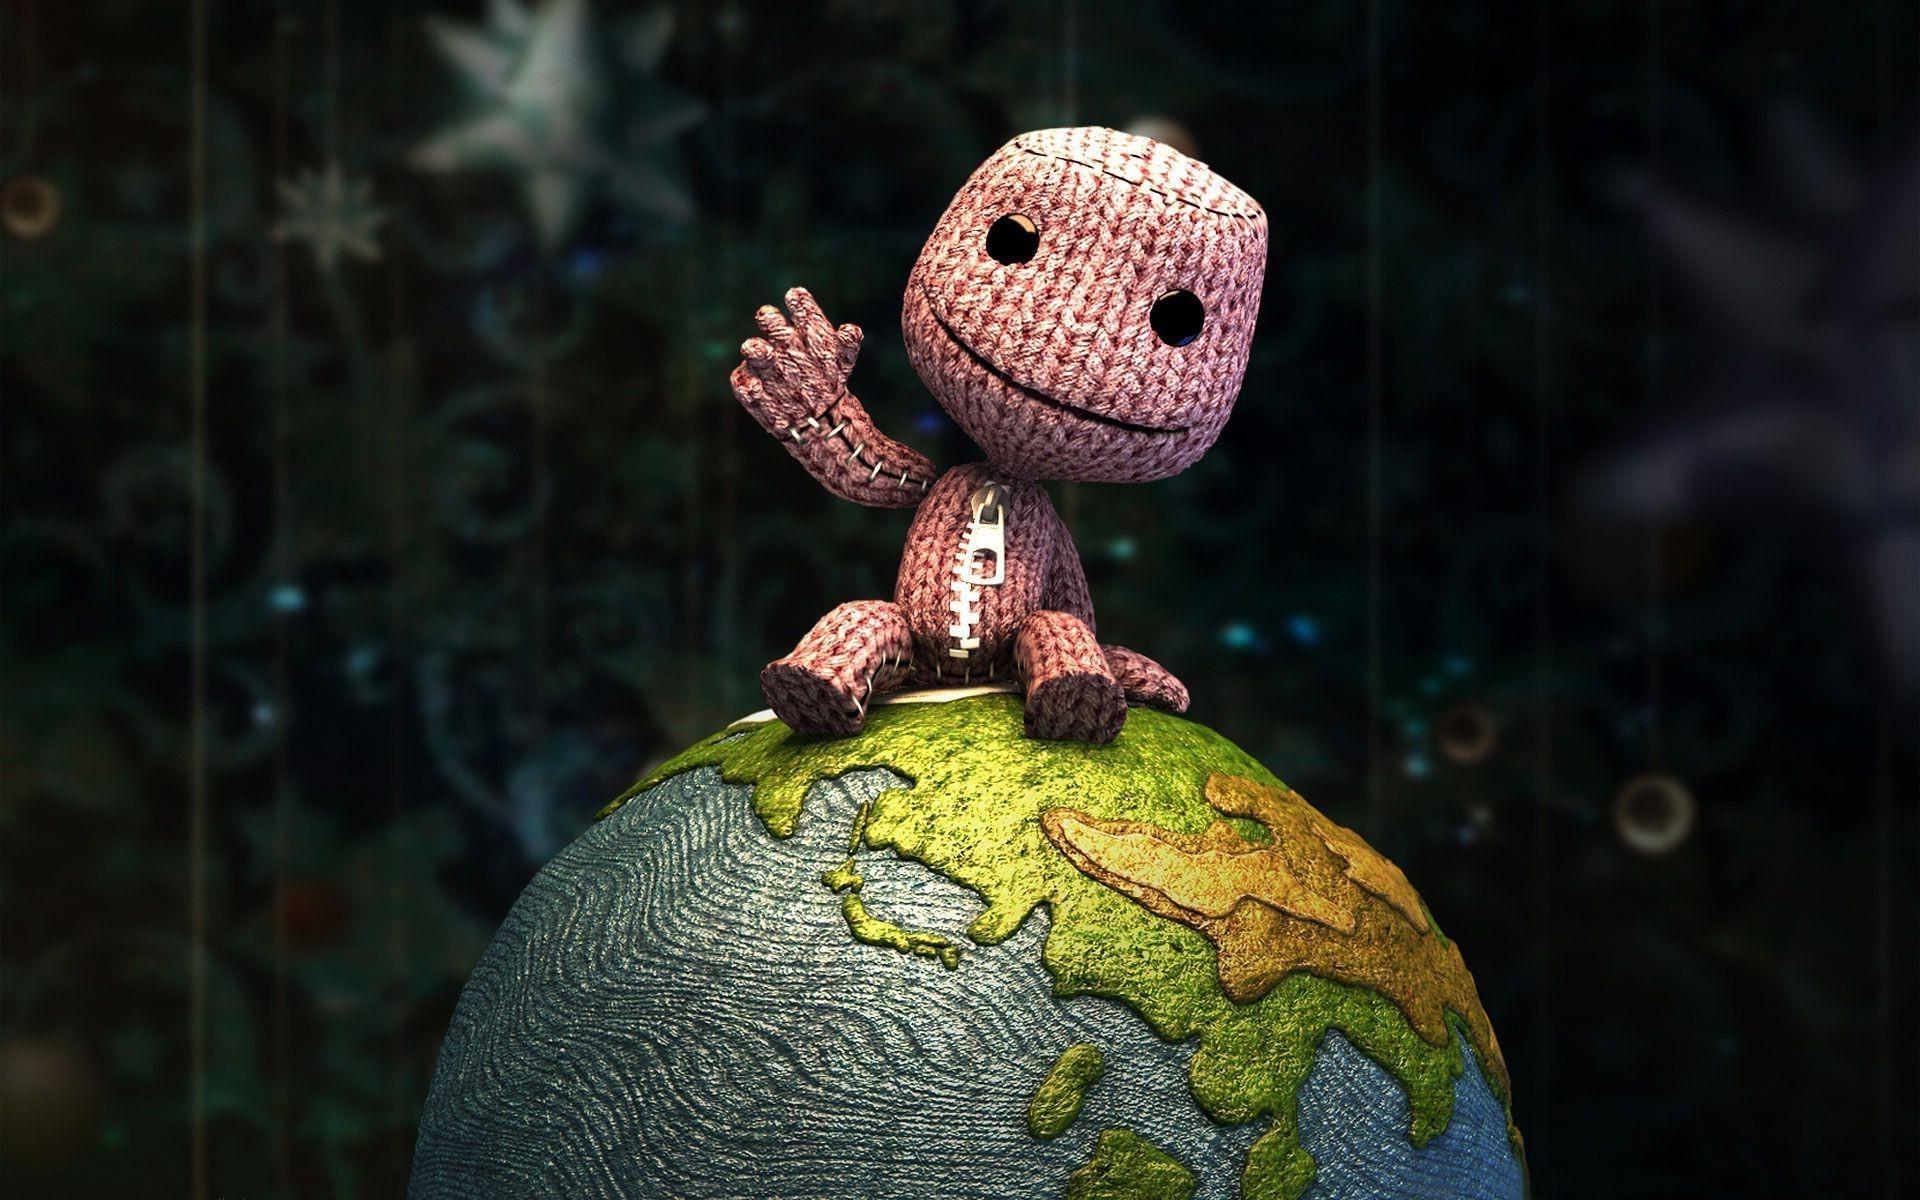 Little Big Planet, Sackboy Wallpapers HD / Desktop and Mobile Backgrounds